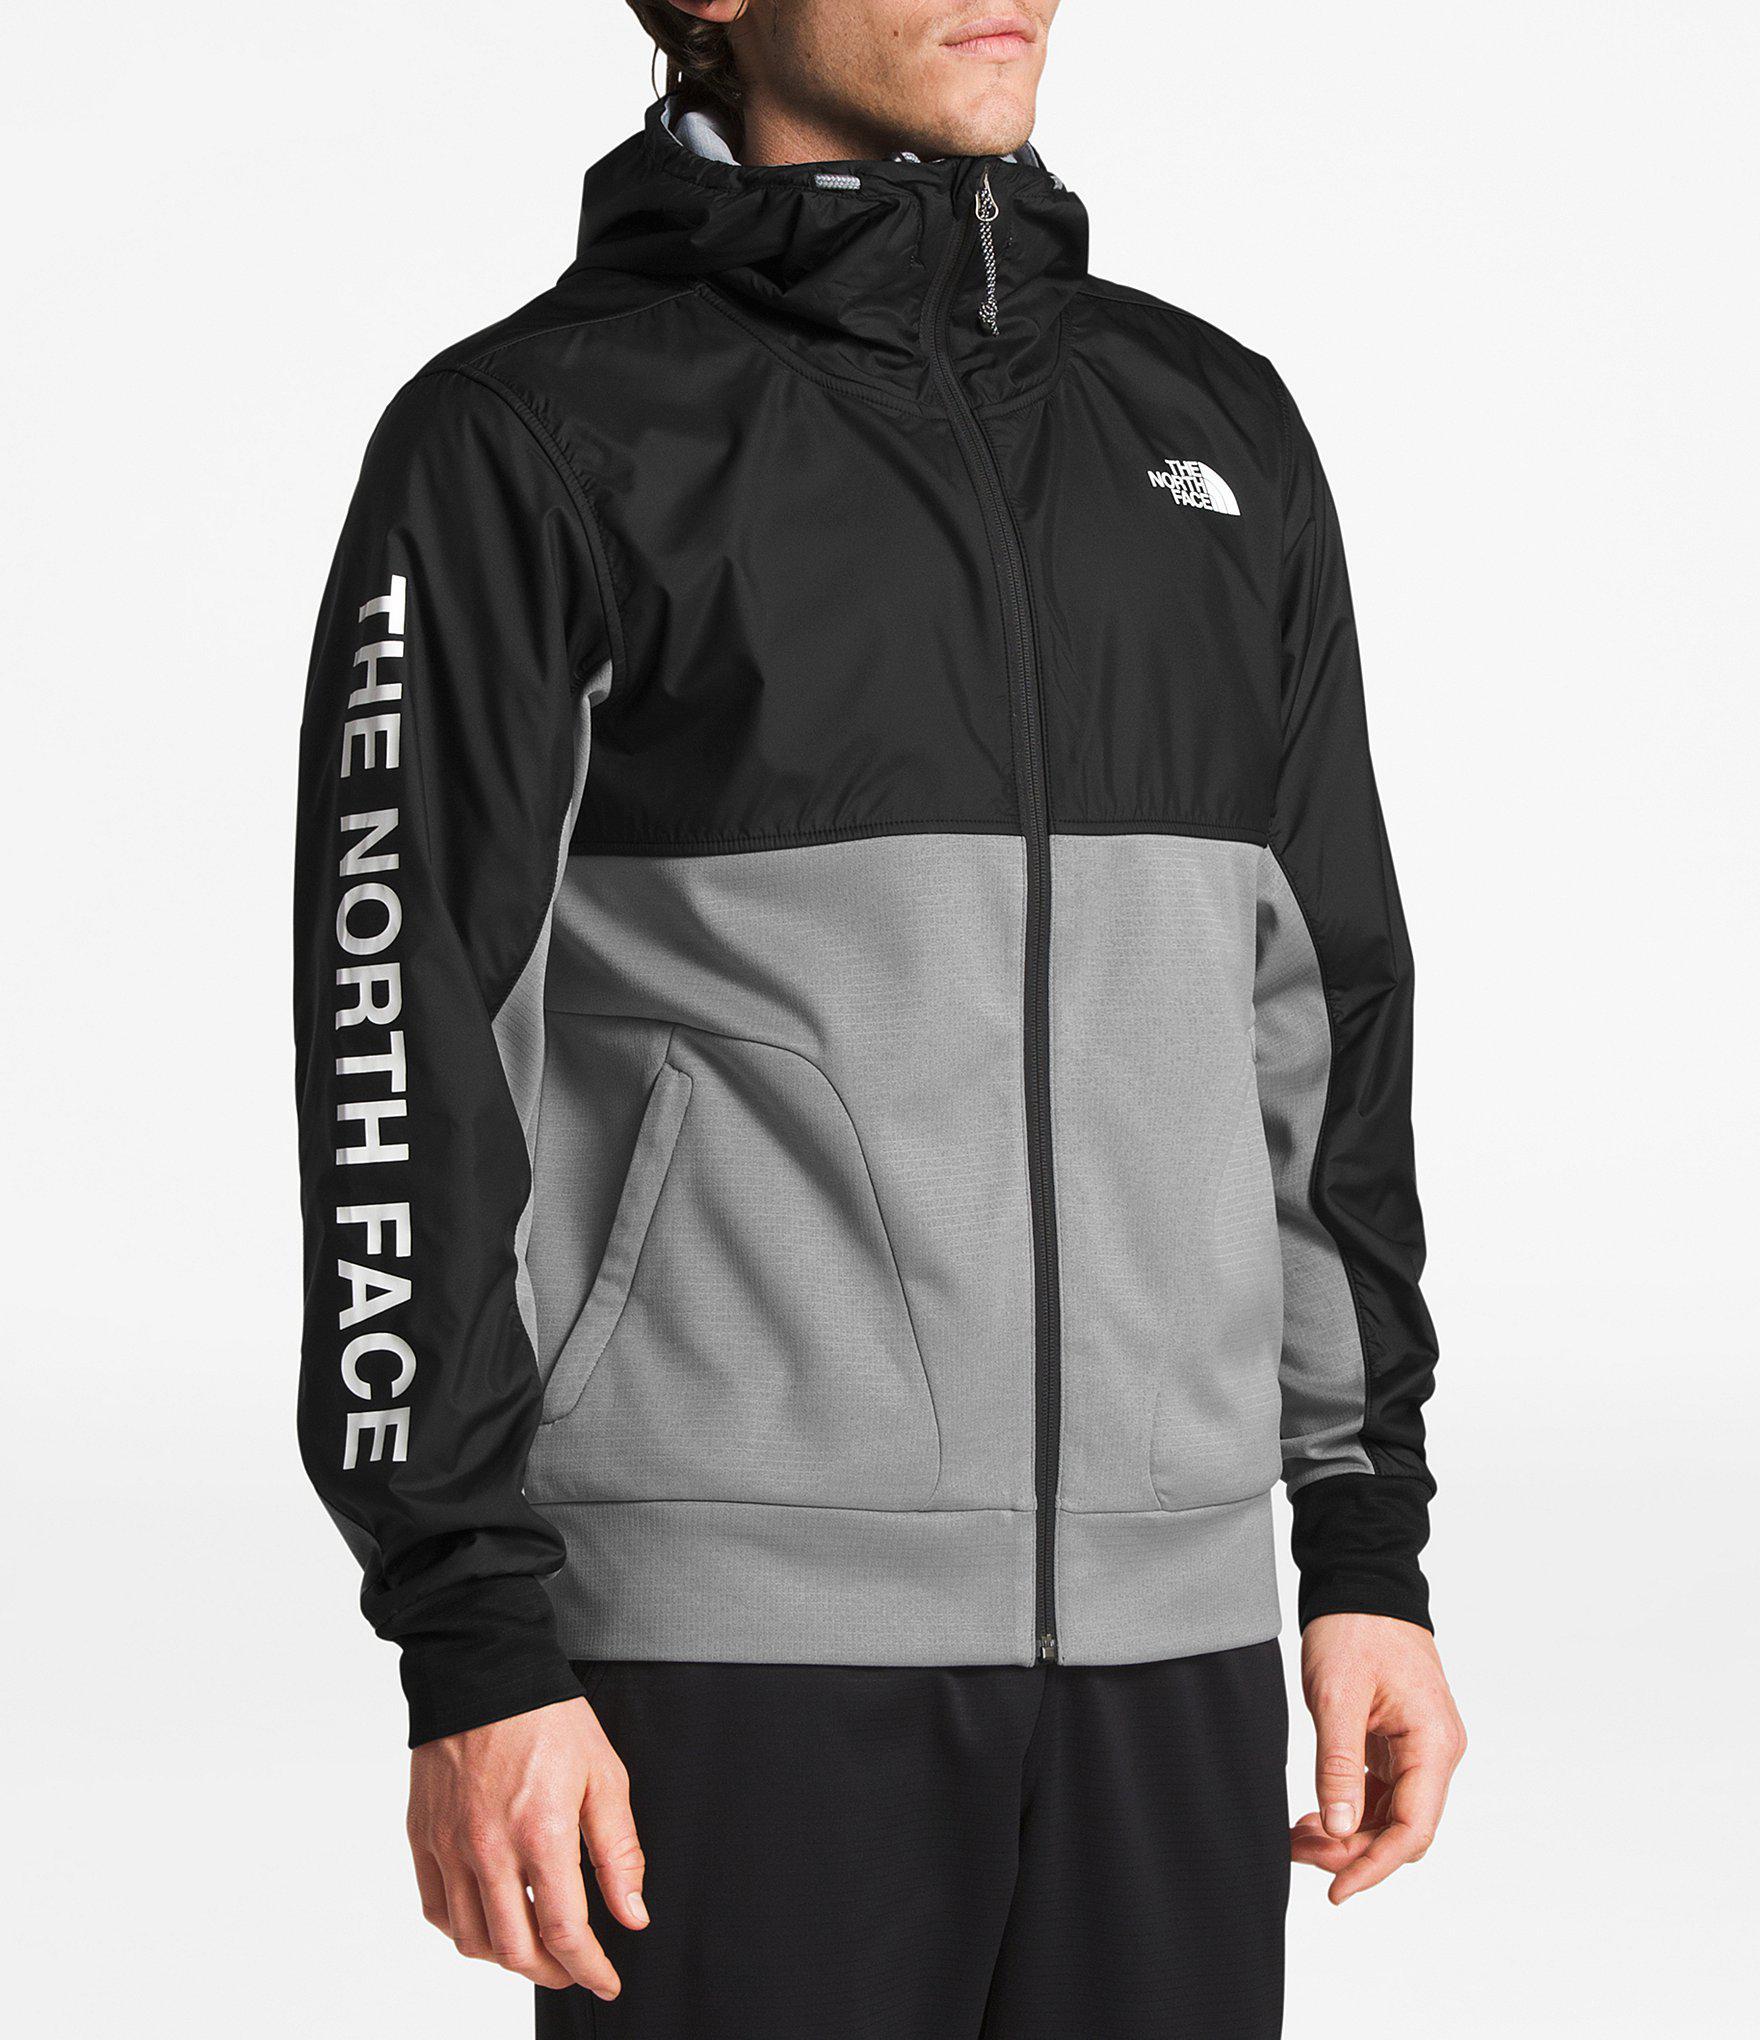 1fc09f002 The North Face Black Fleece Train N Logo Overlay Jacket for men